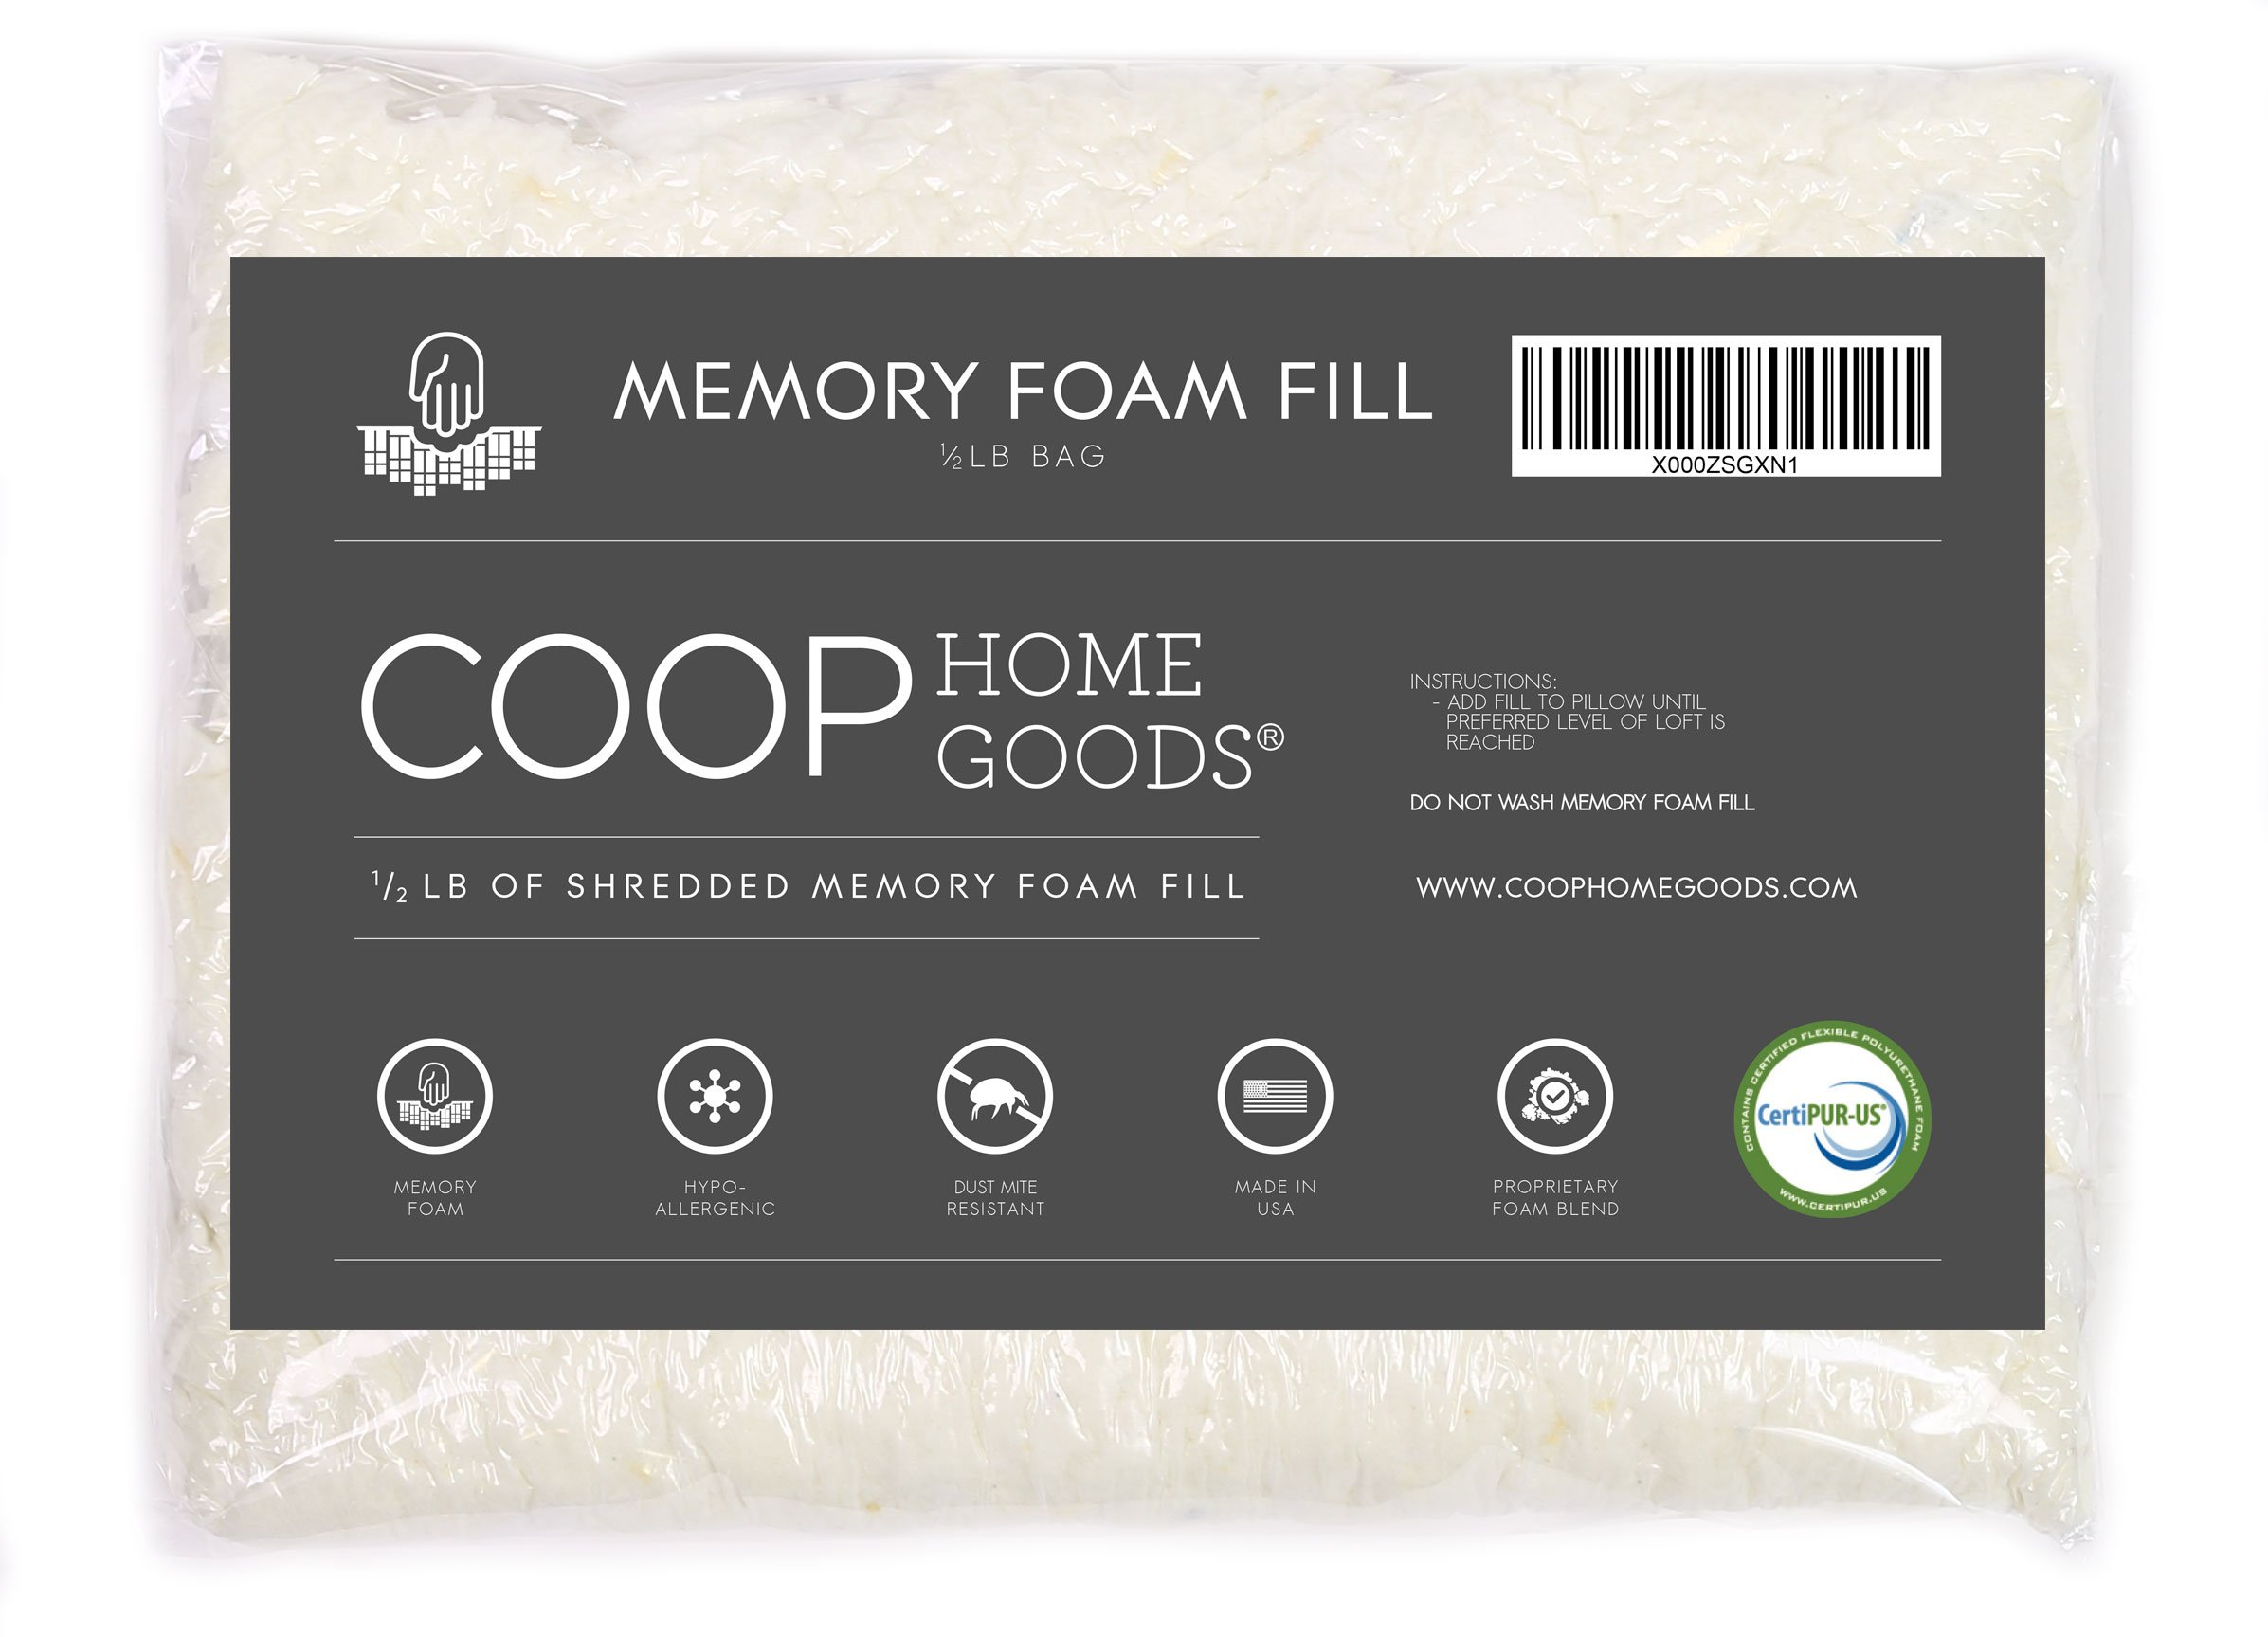 Coop Home Goods Adjustable Shredded Memory Foam Pillow Firm Refill - Foam 1/2 LB